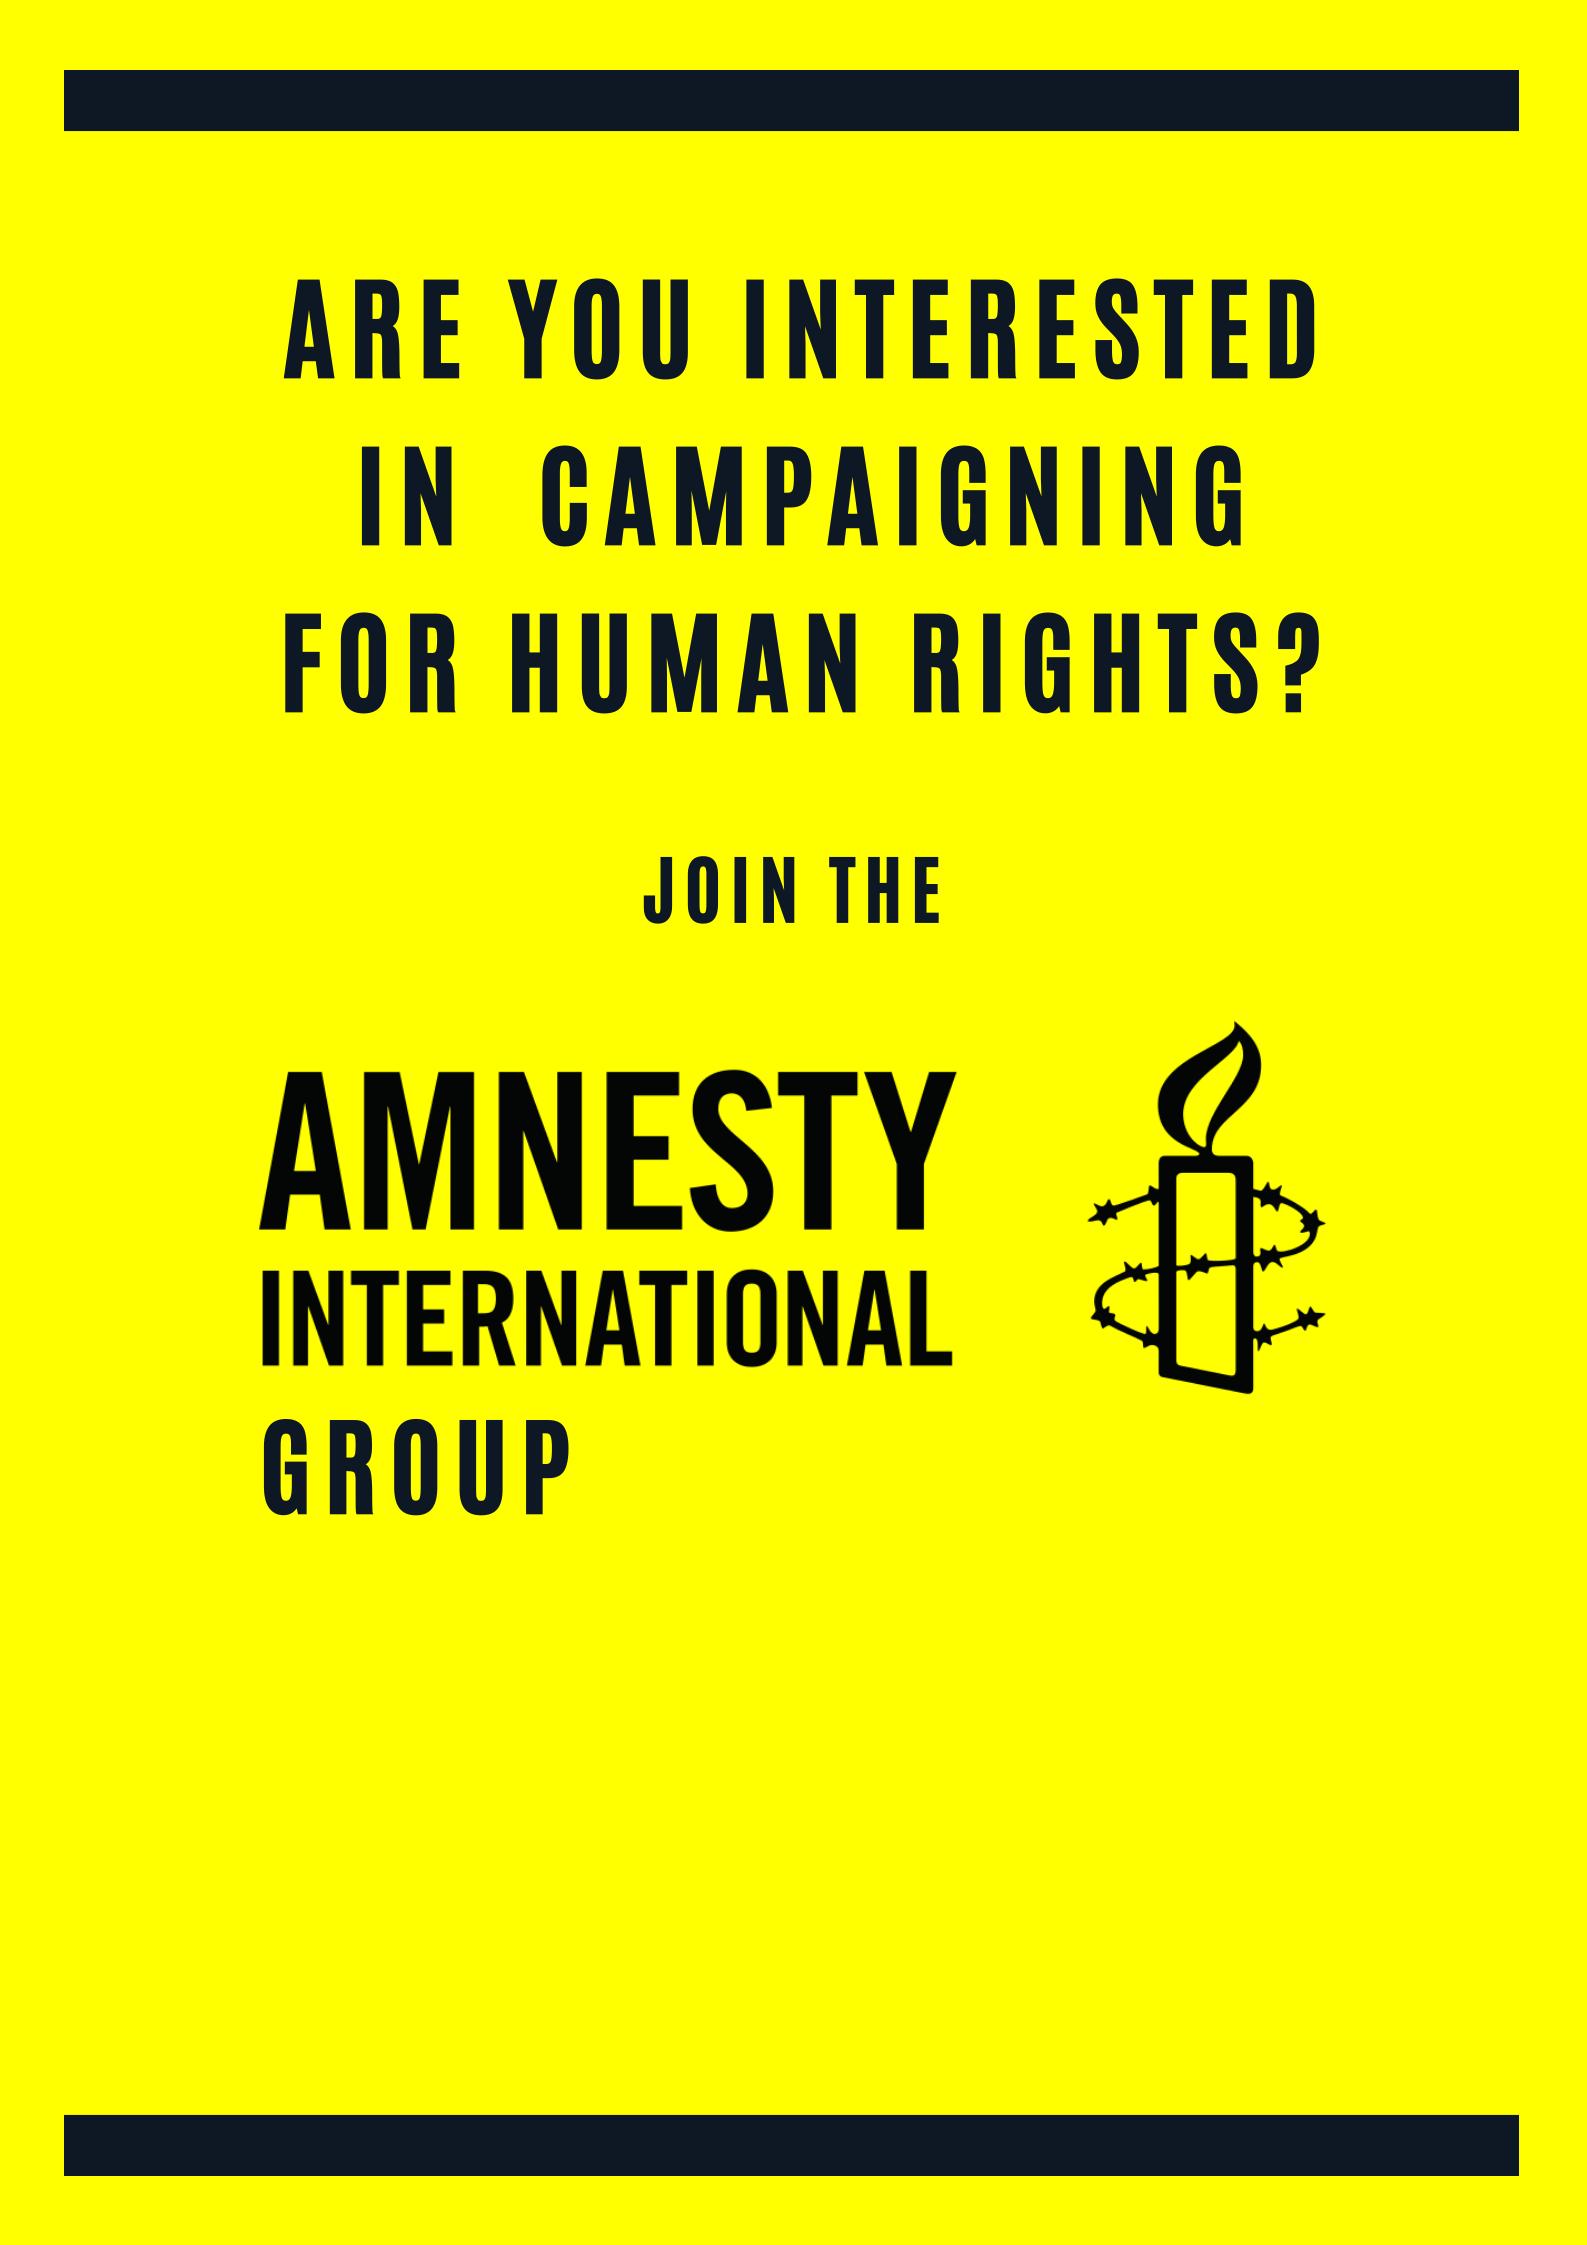 Amnesty international group